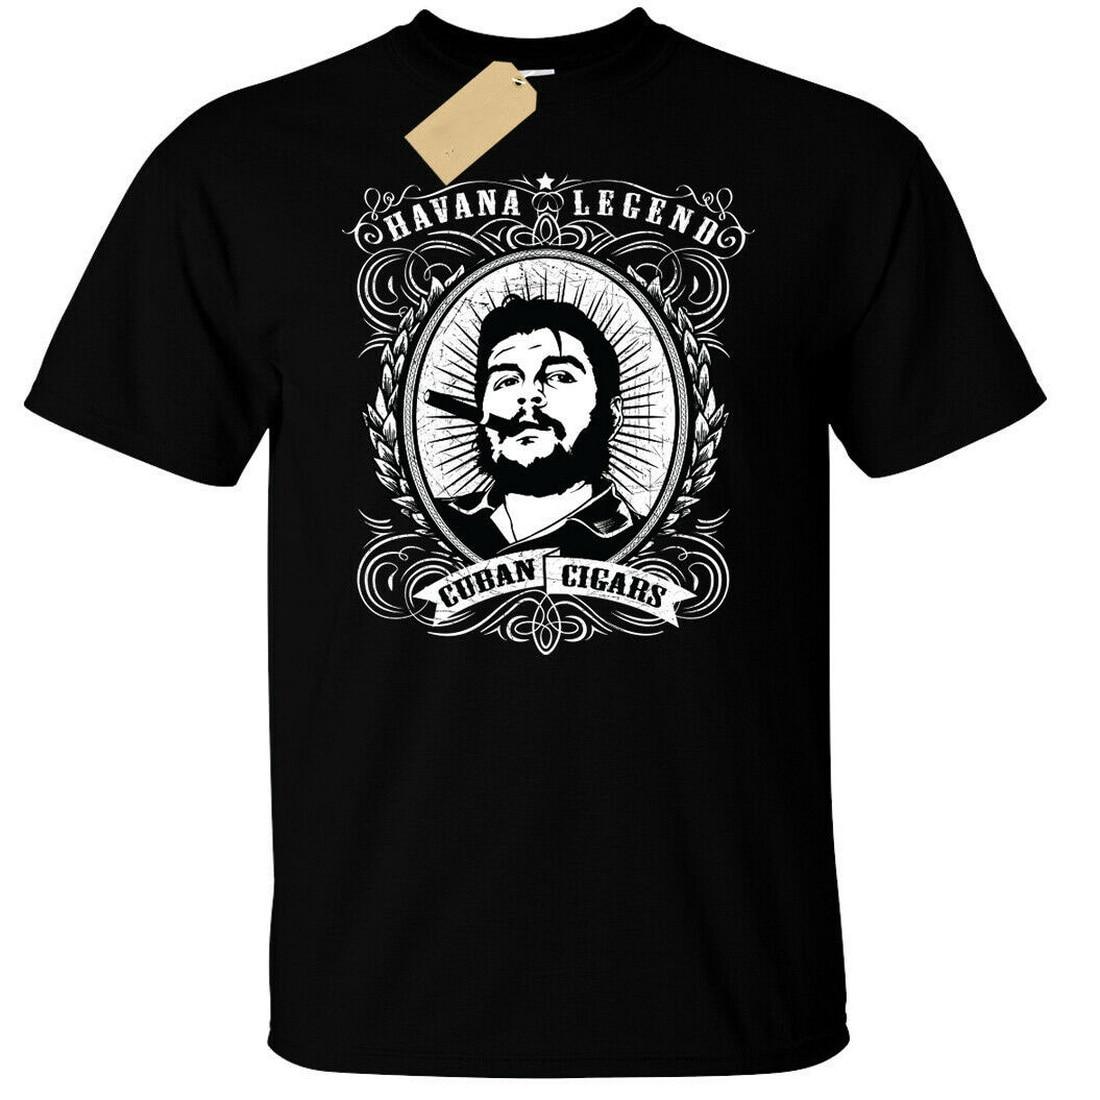 Puros cubanos Tops camiseta para hombre Che Havana Legend camiseta Última Noticia Style